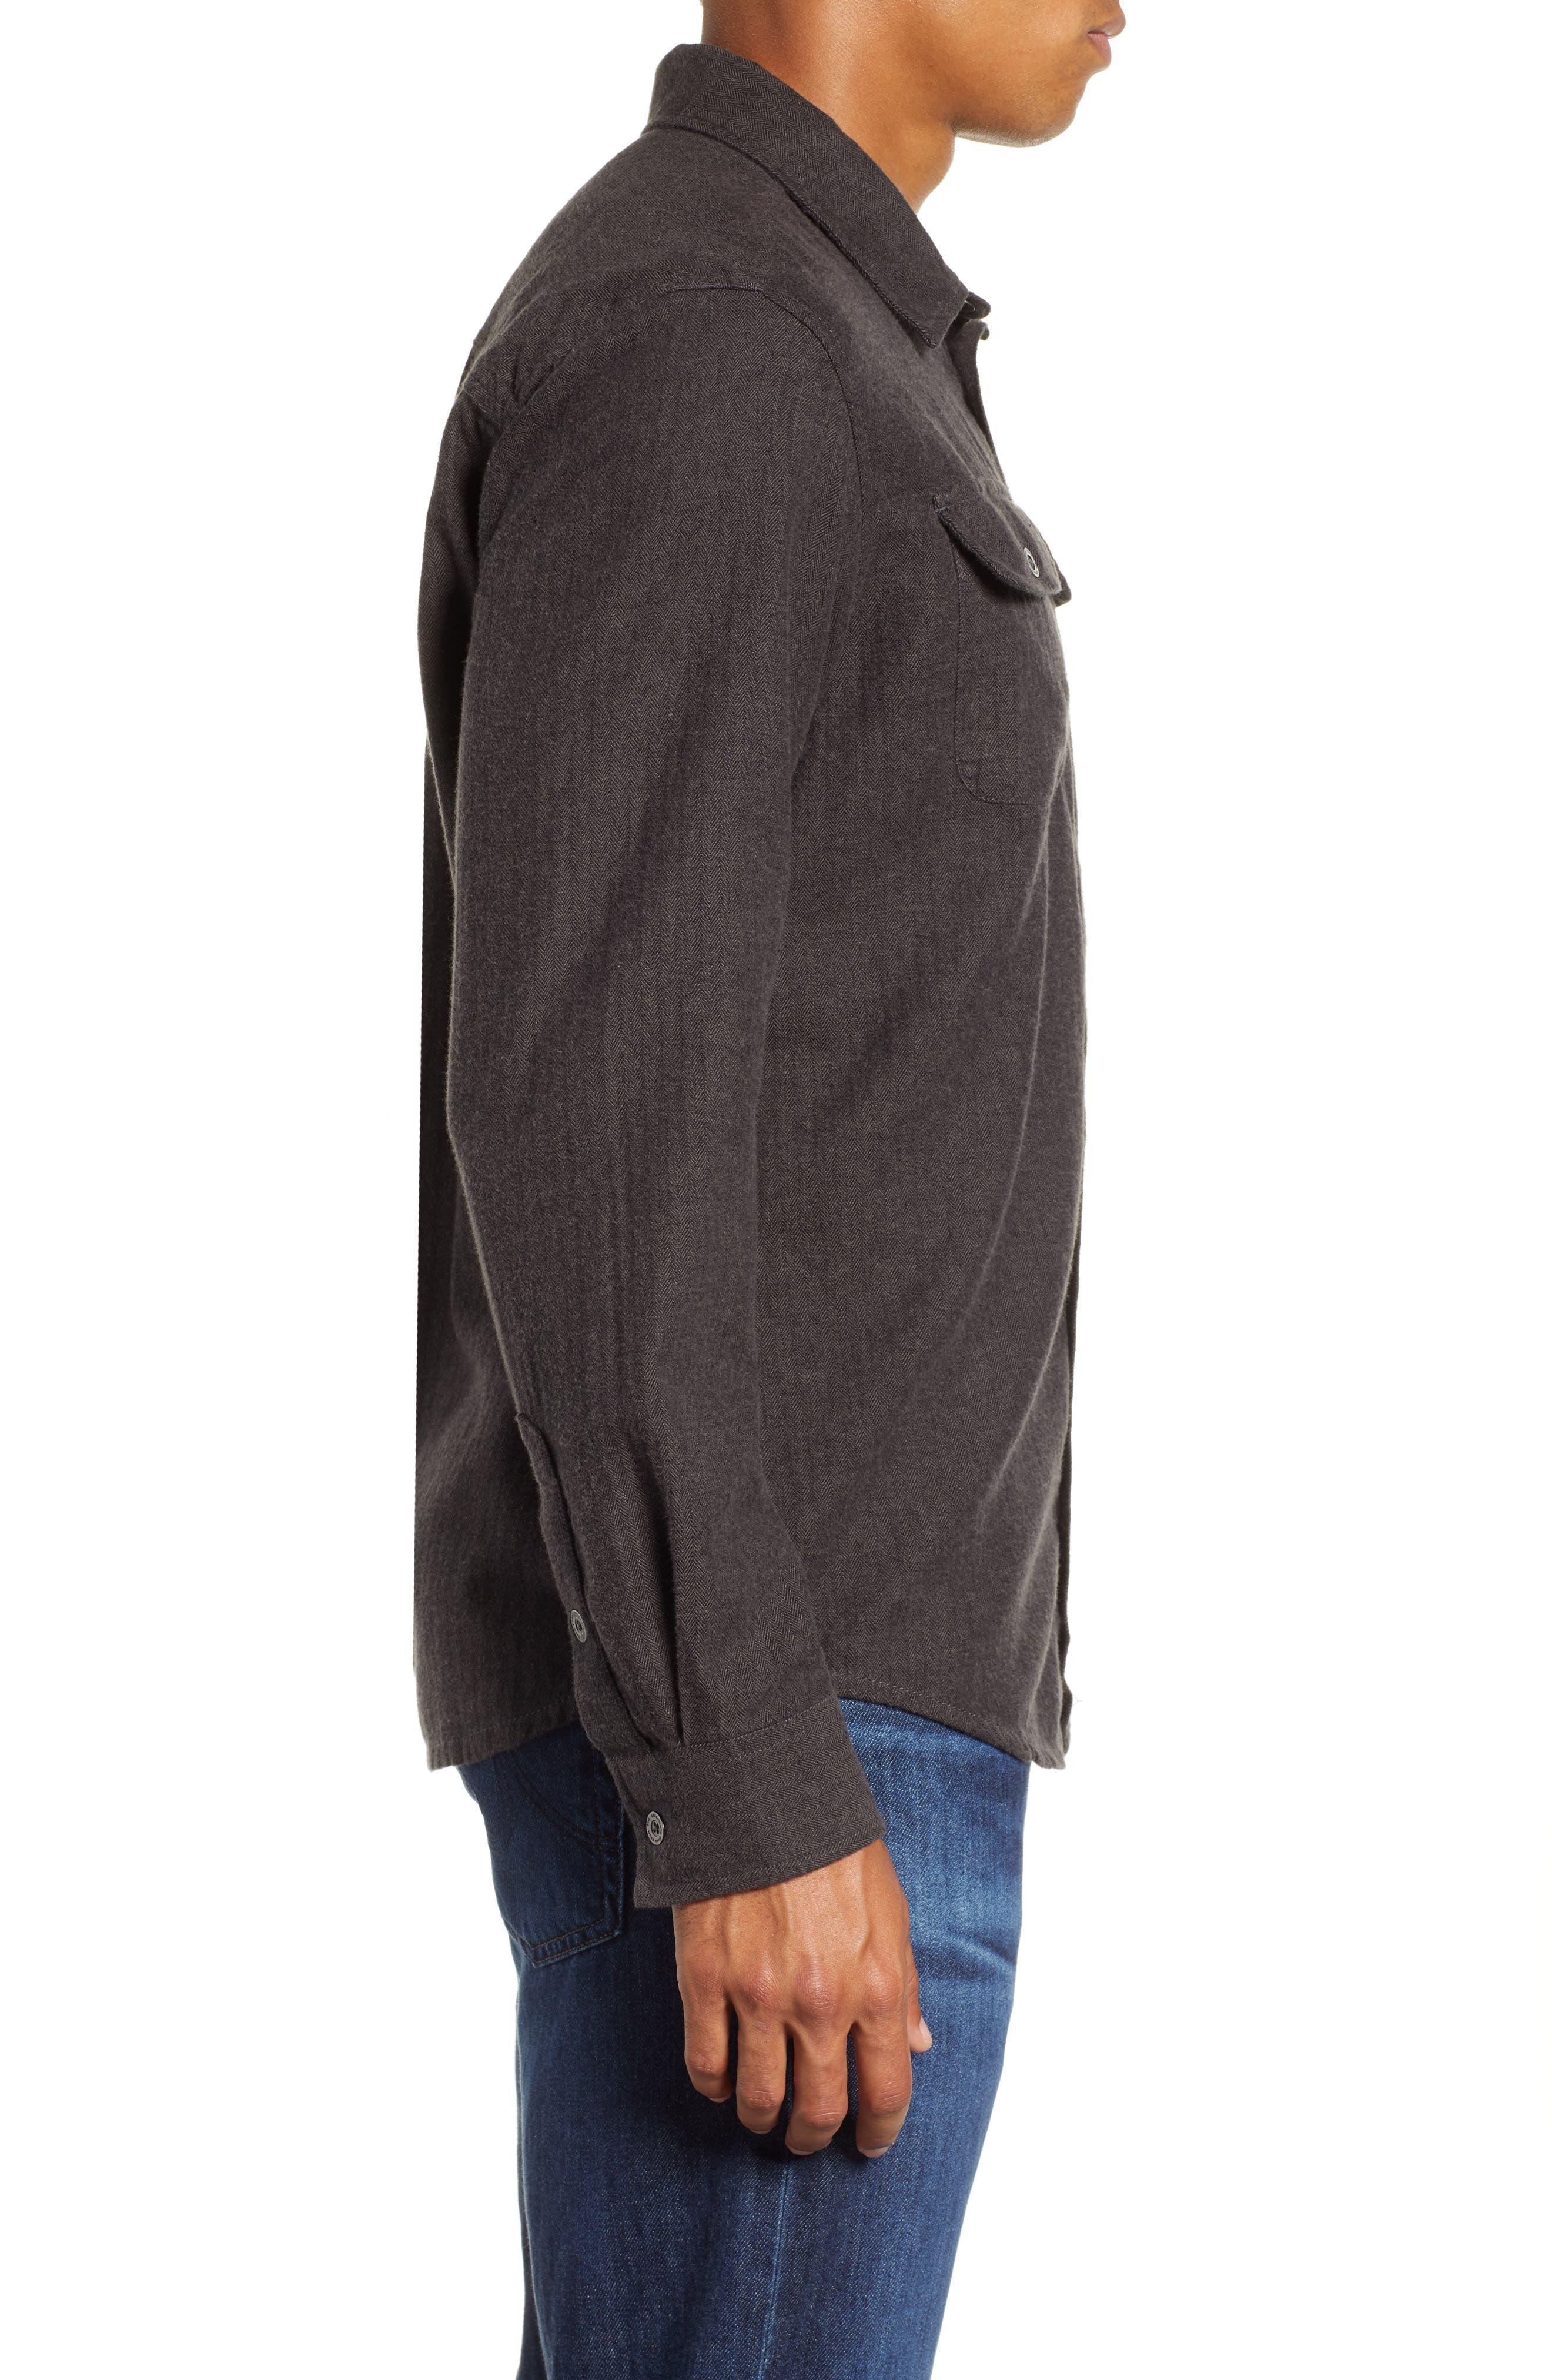 Lybek Regular Fit Herringbone Flannel Shirt,                             Alternate thumbnail 4, color,                             SCORCHED BROWN HERRINGBONE